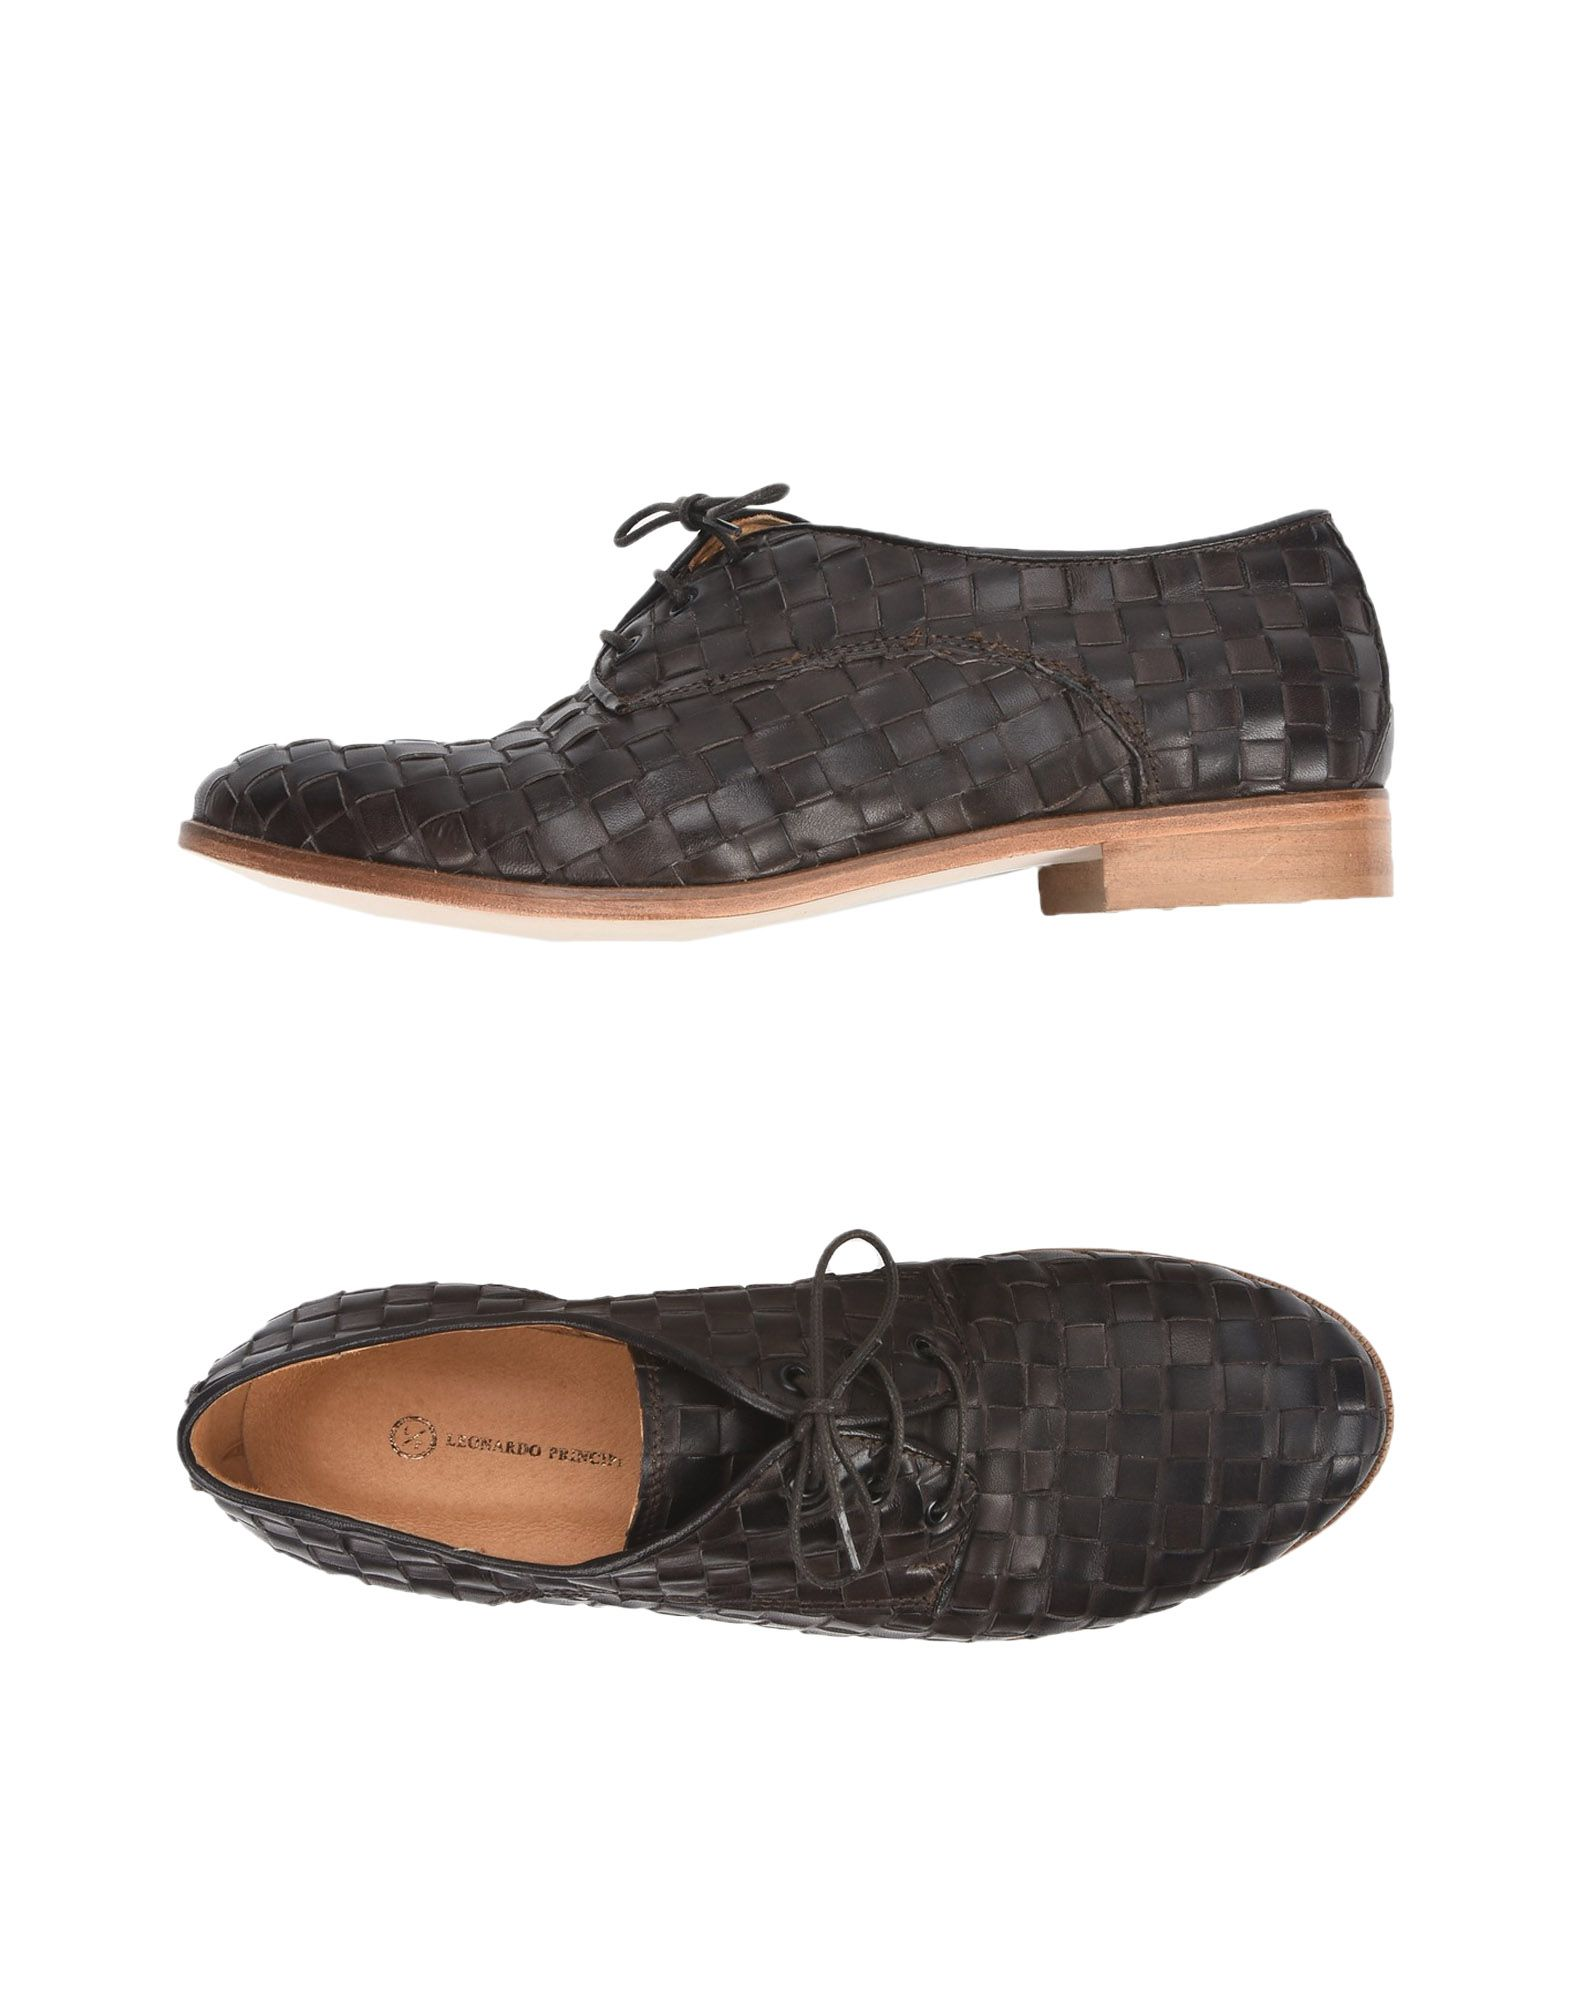 Leonardo Principi Schnürschuhe Damen  11230269TS Gute Qualität beliebte Schuhe